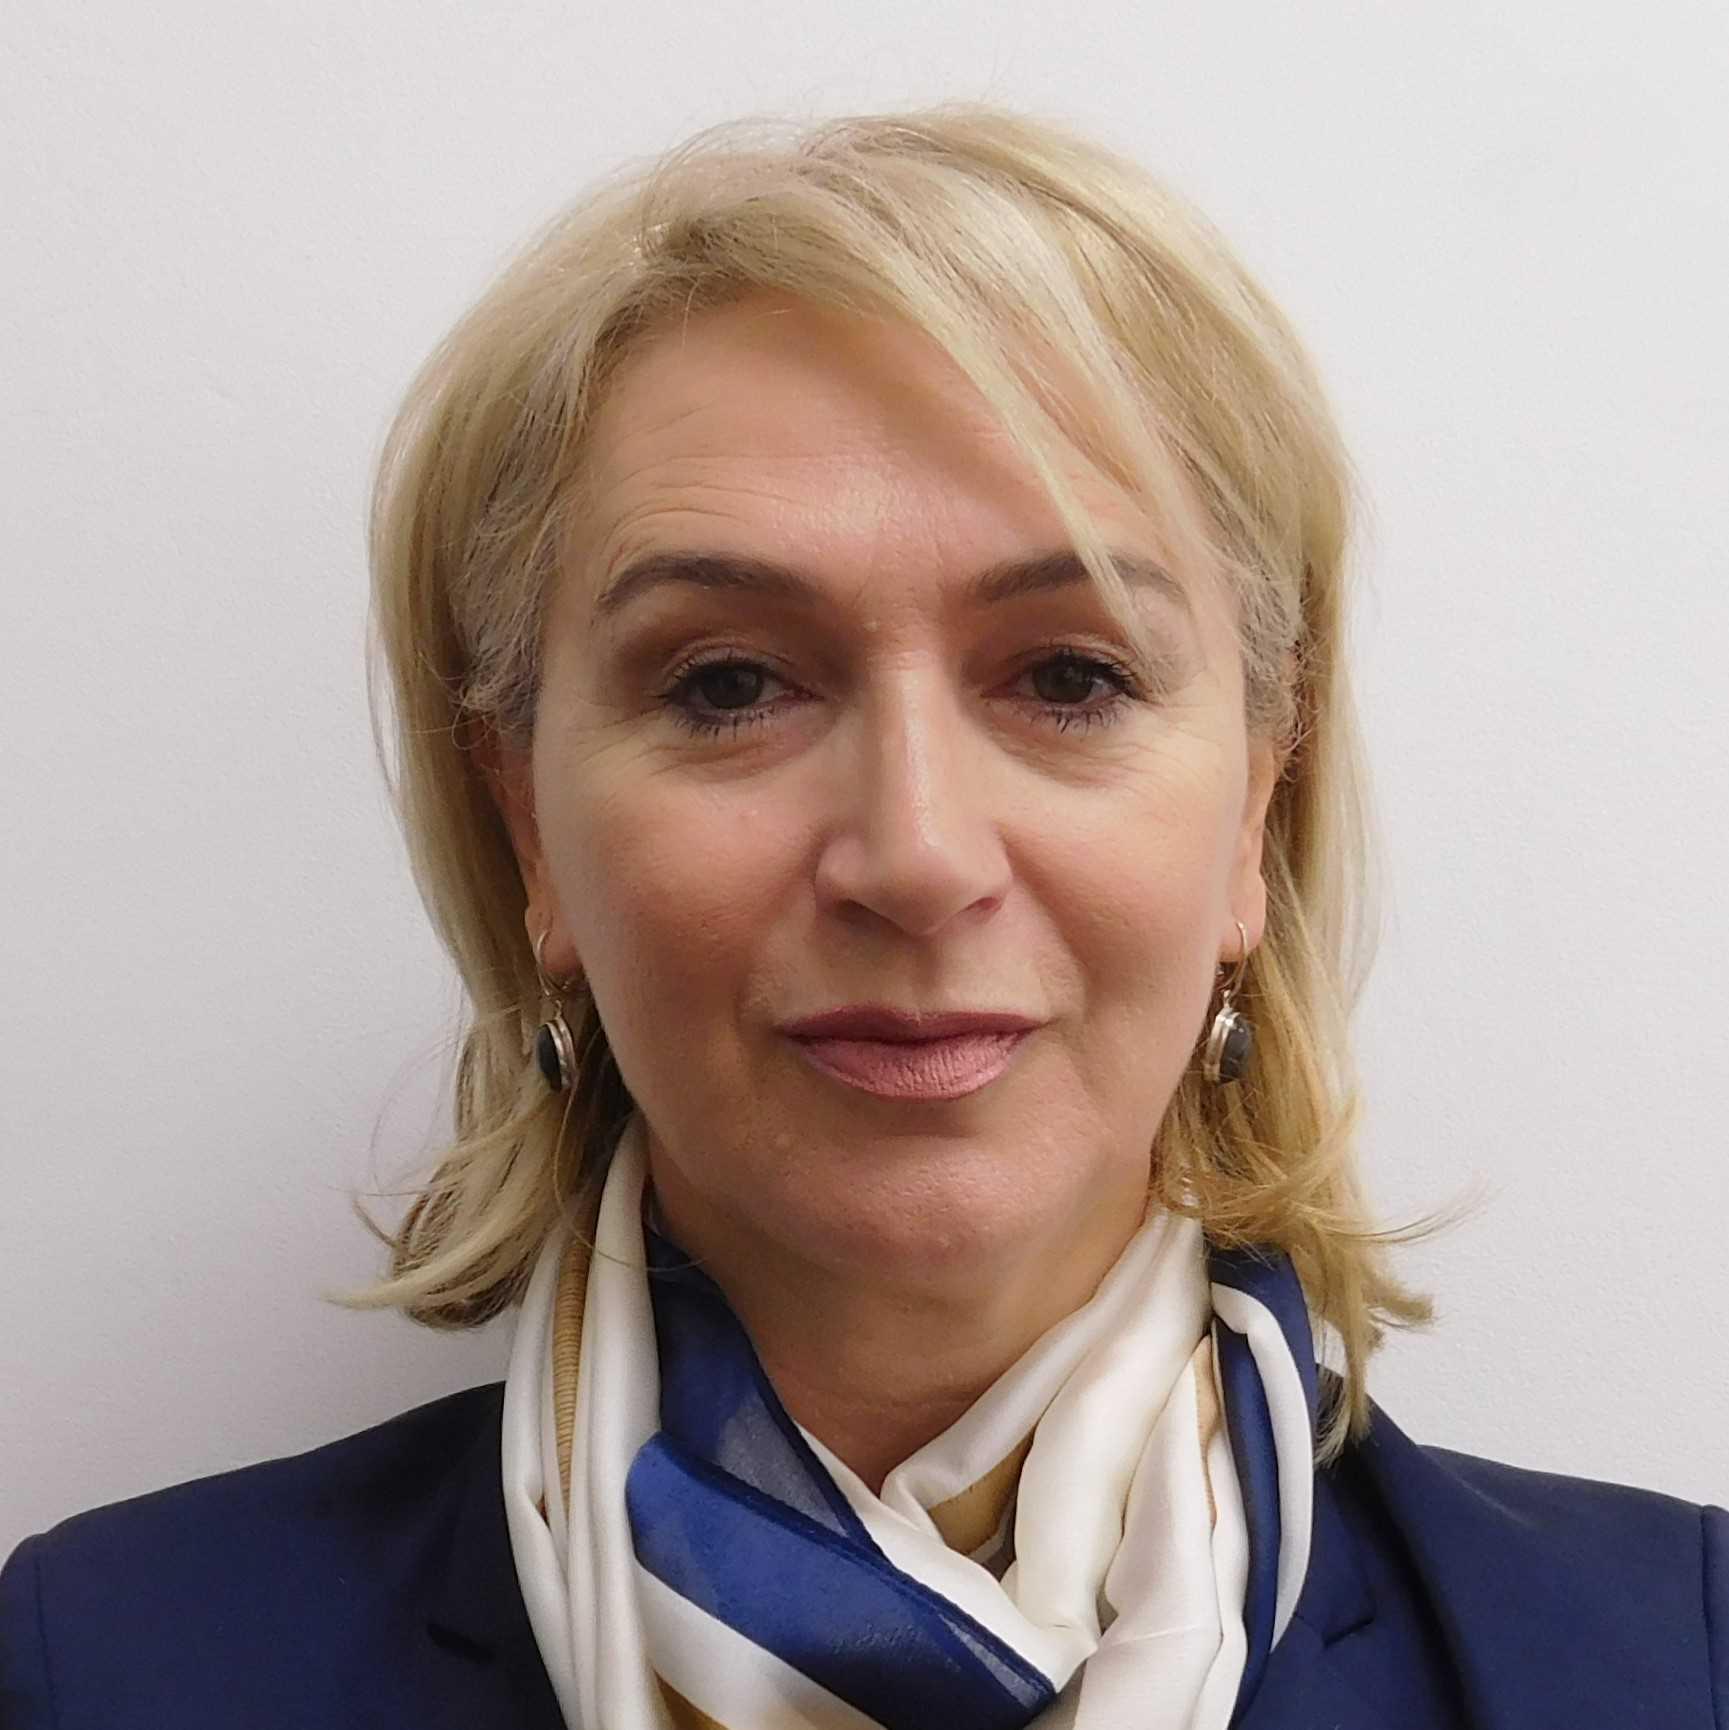 Violeta Nushi